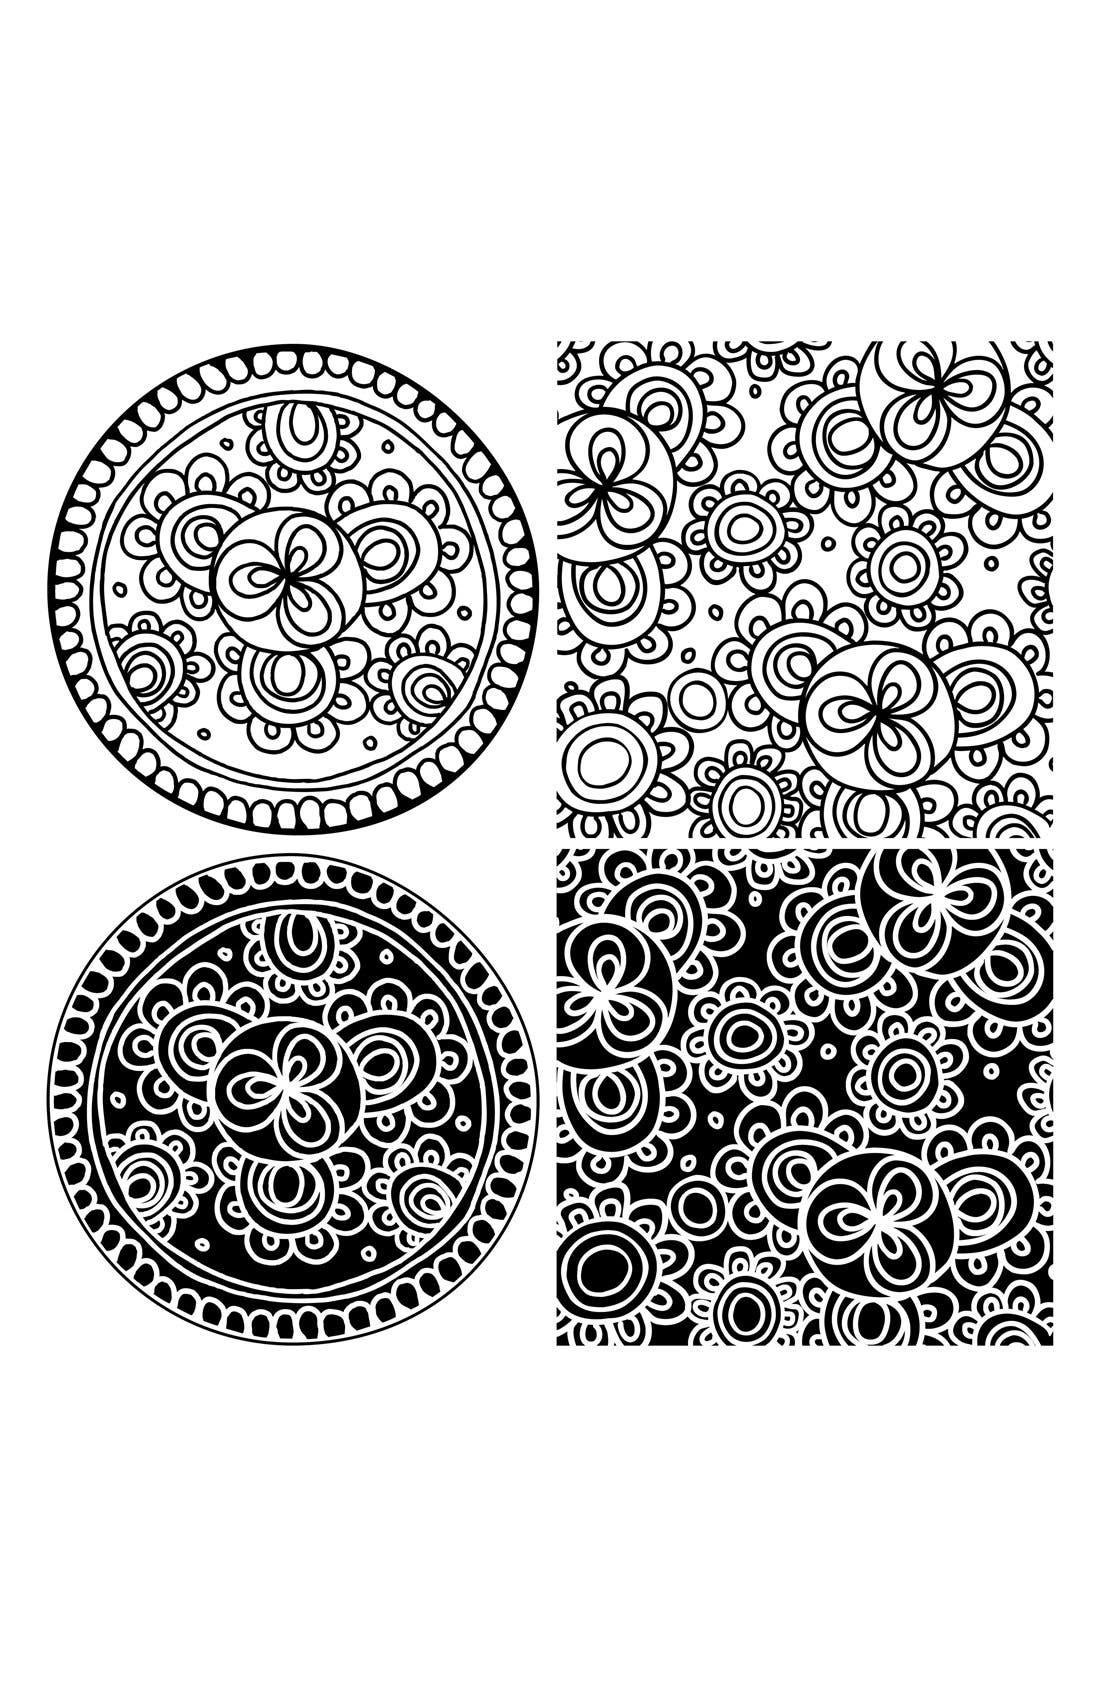 Alternate Image 1 Selected - Wallpops 'Bali Dots & Blox' Wall Art